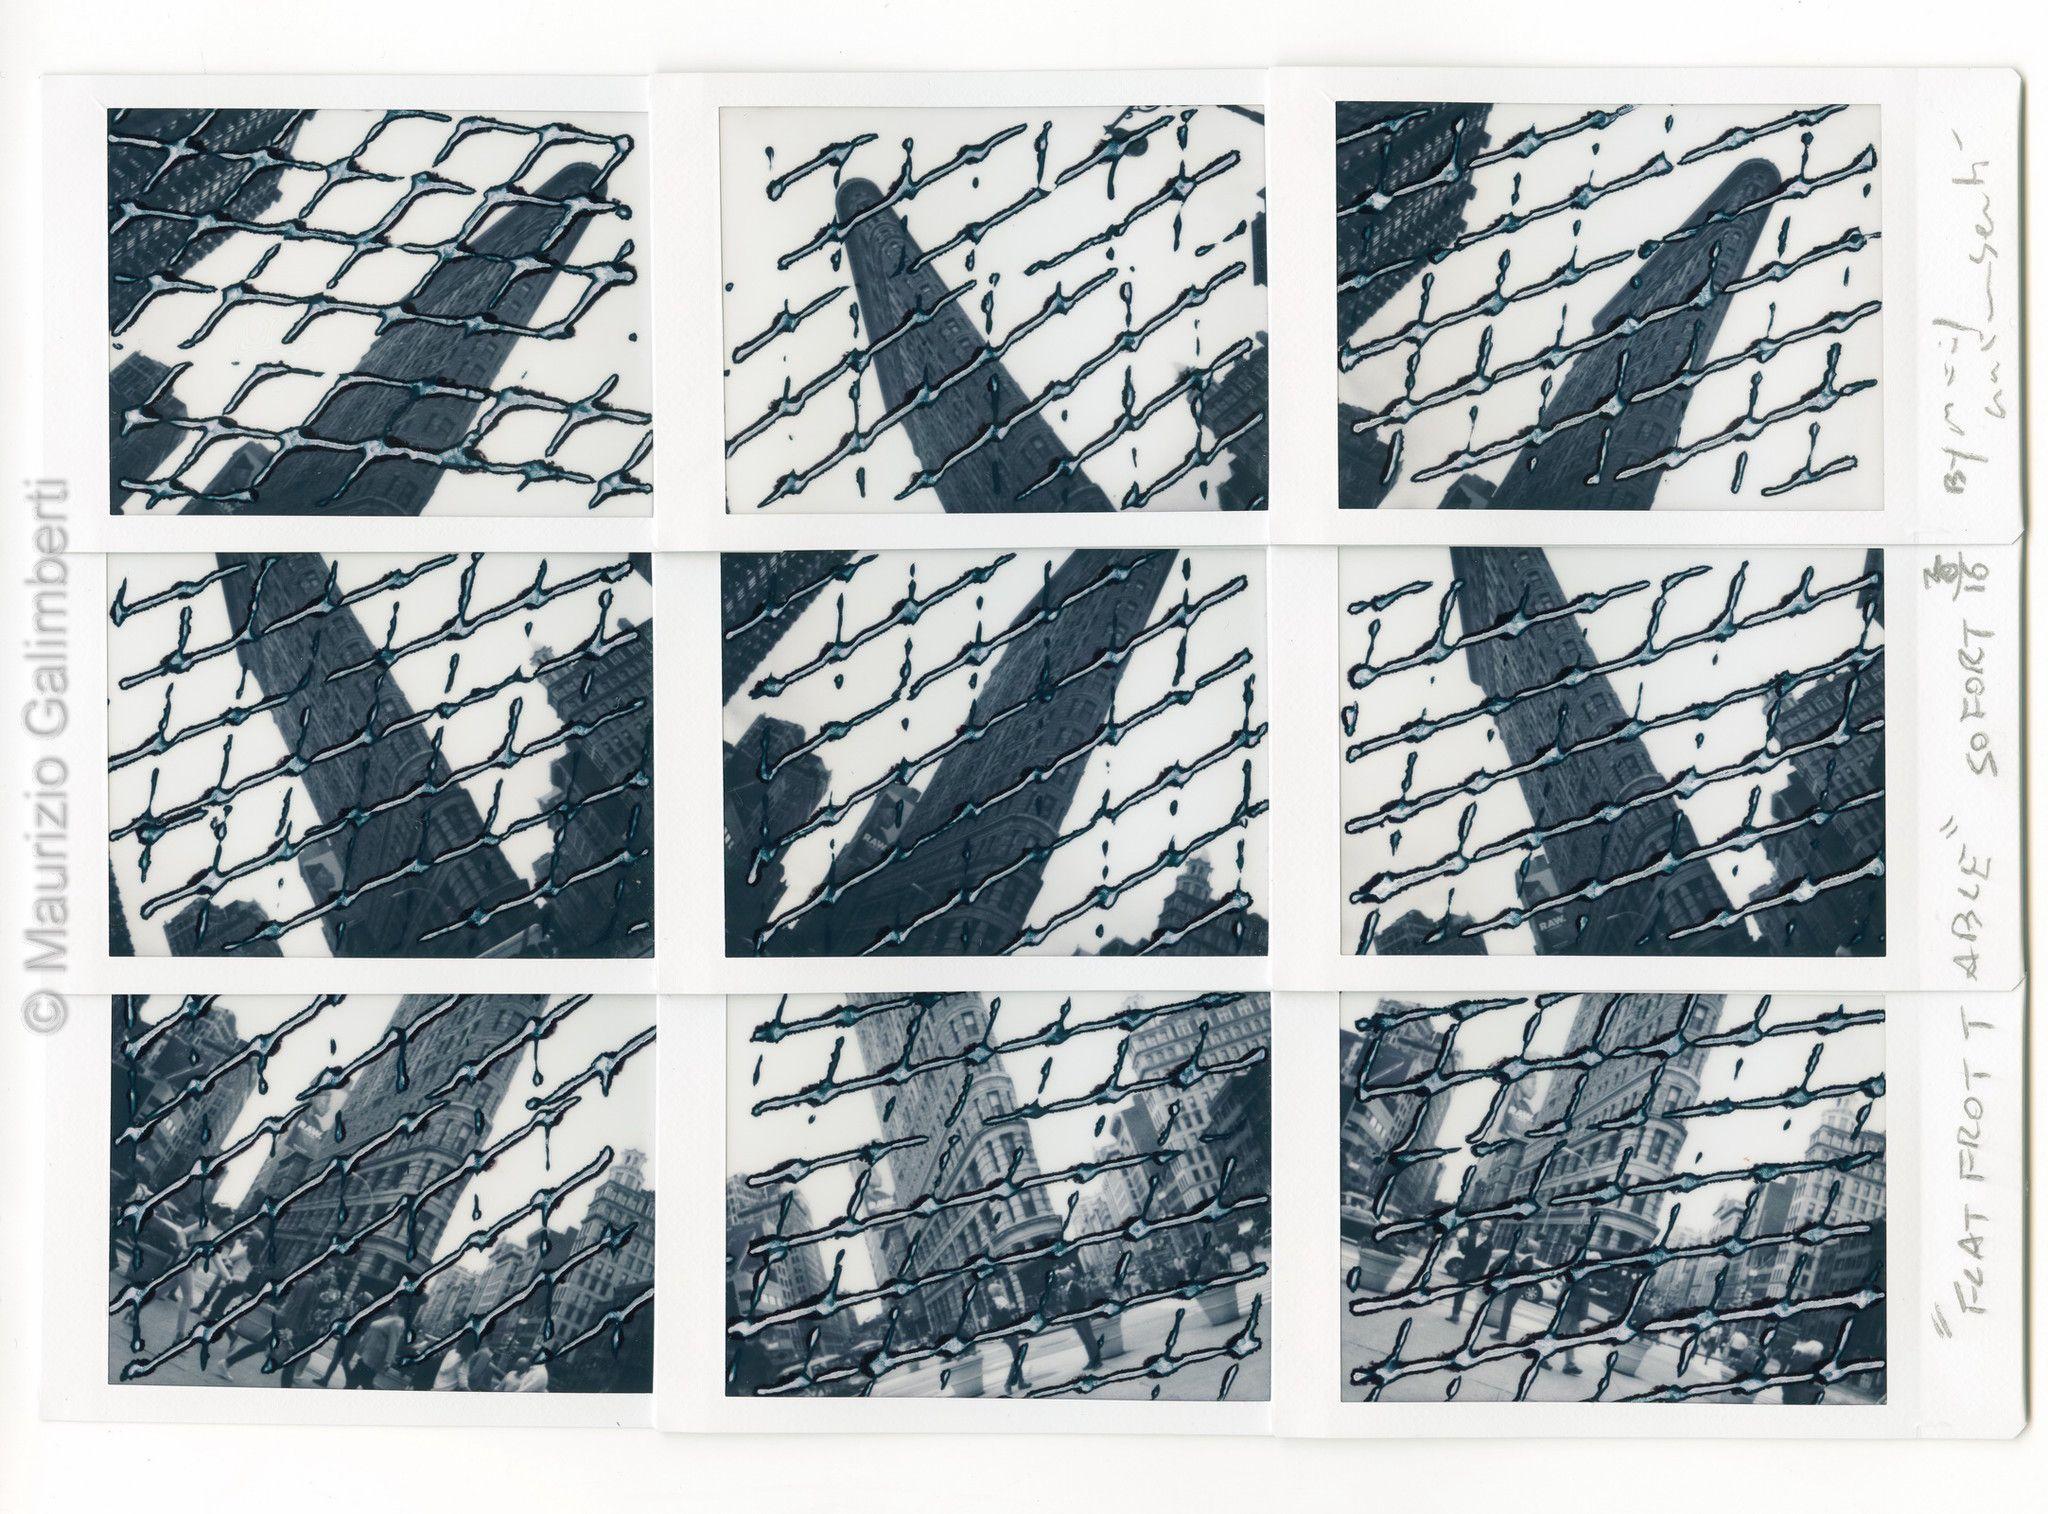 VINTAGE POLAROID MAURIZIO GALIMBERTI 'FLAT FROTTABLE' dimensioni cm. 46x39